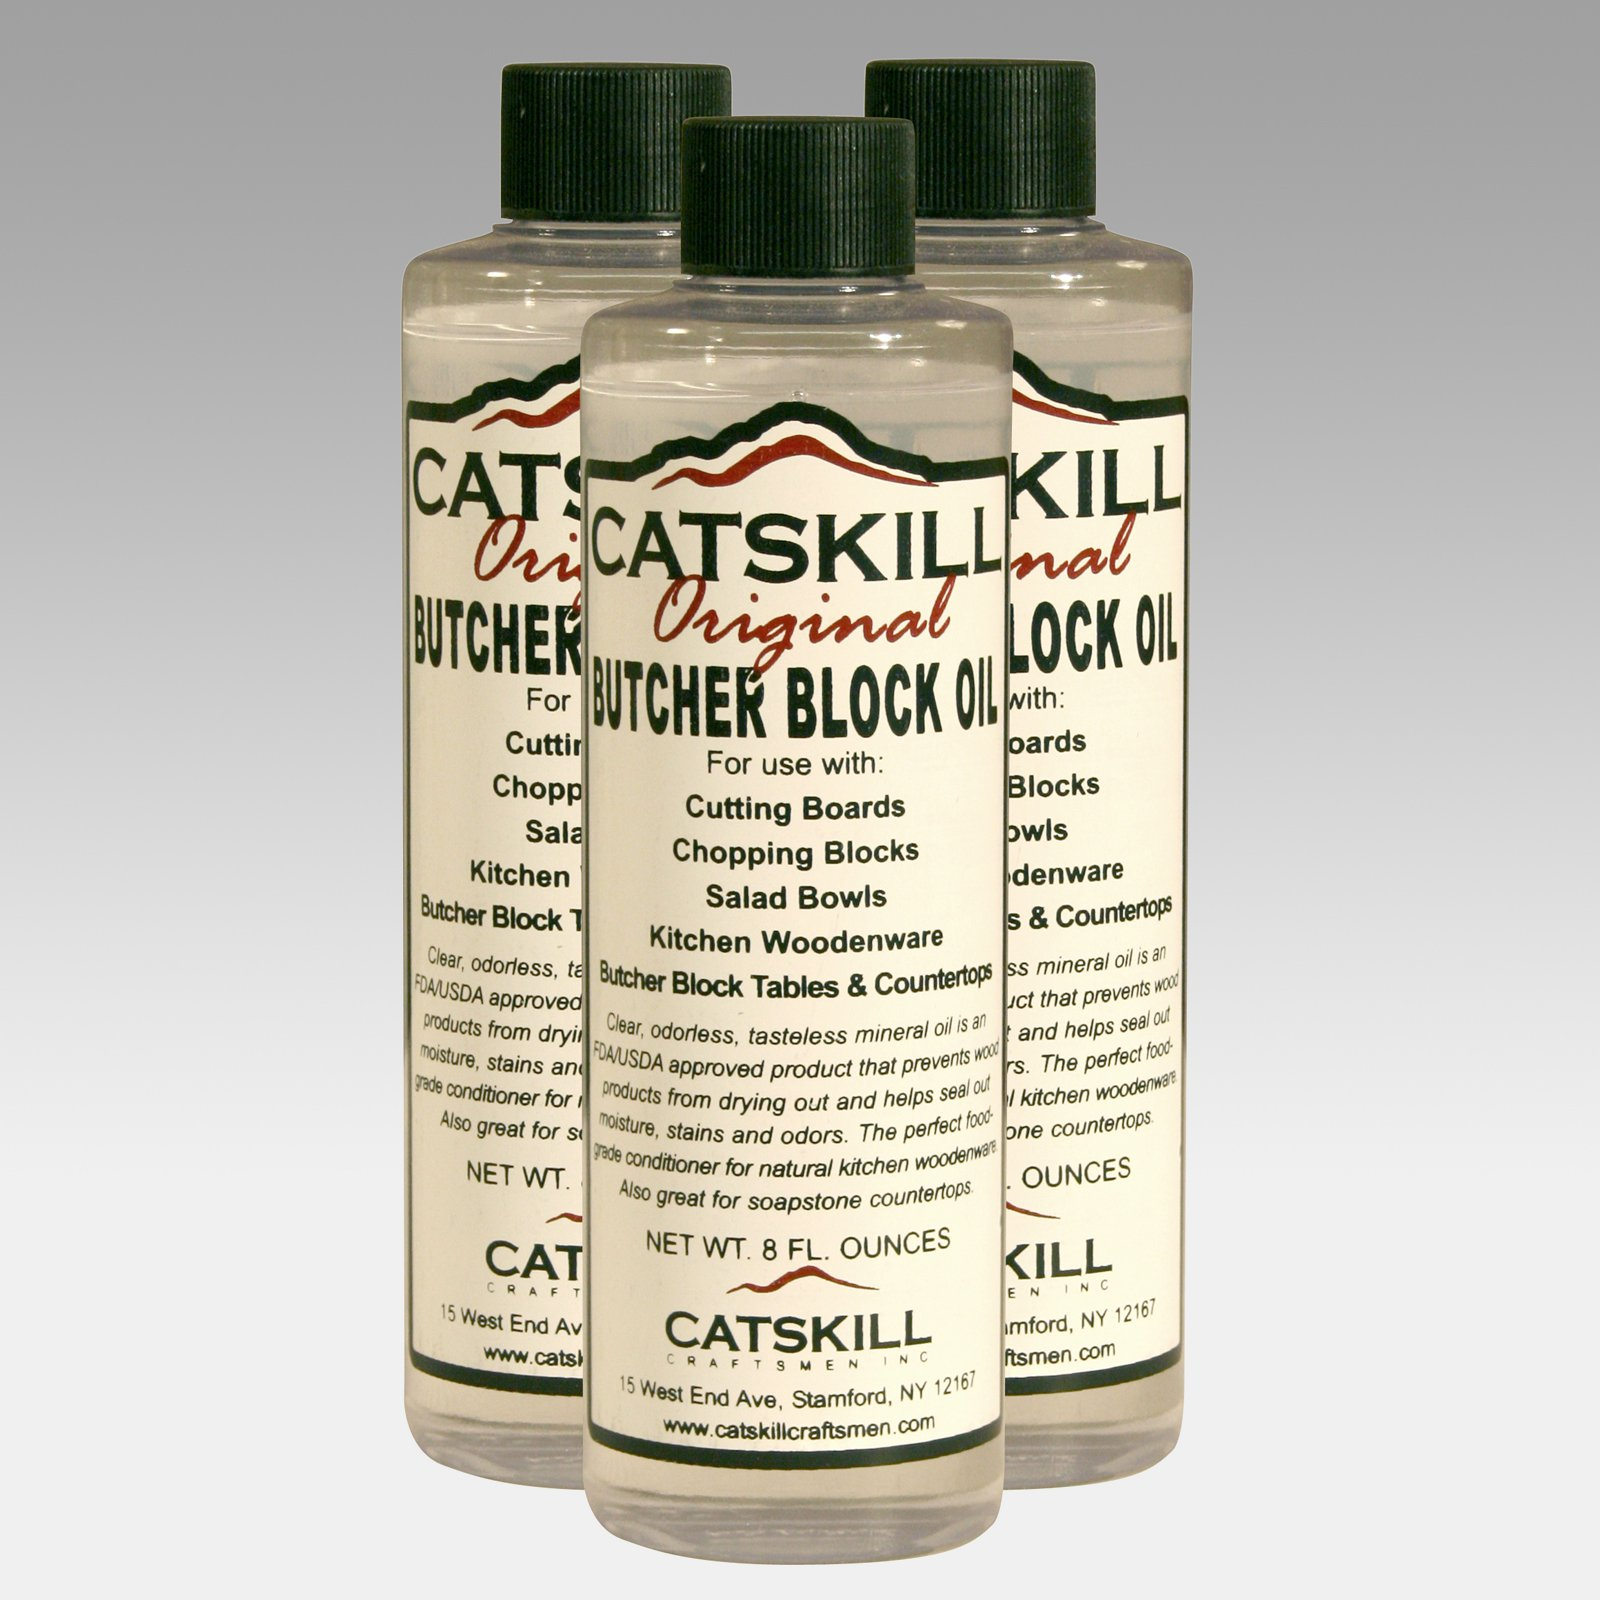 Set of 3 - 8oz Bottles of Butcher Block Oil